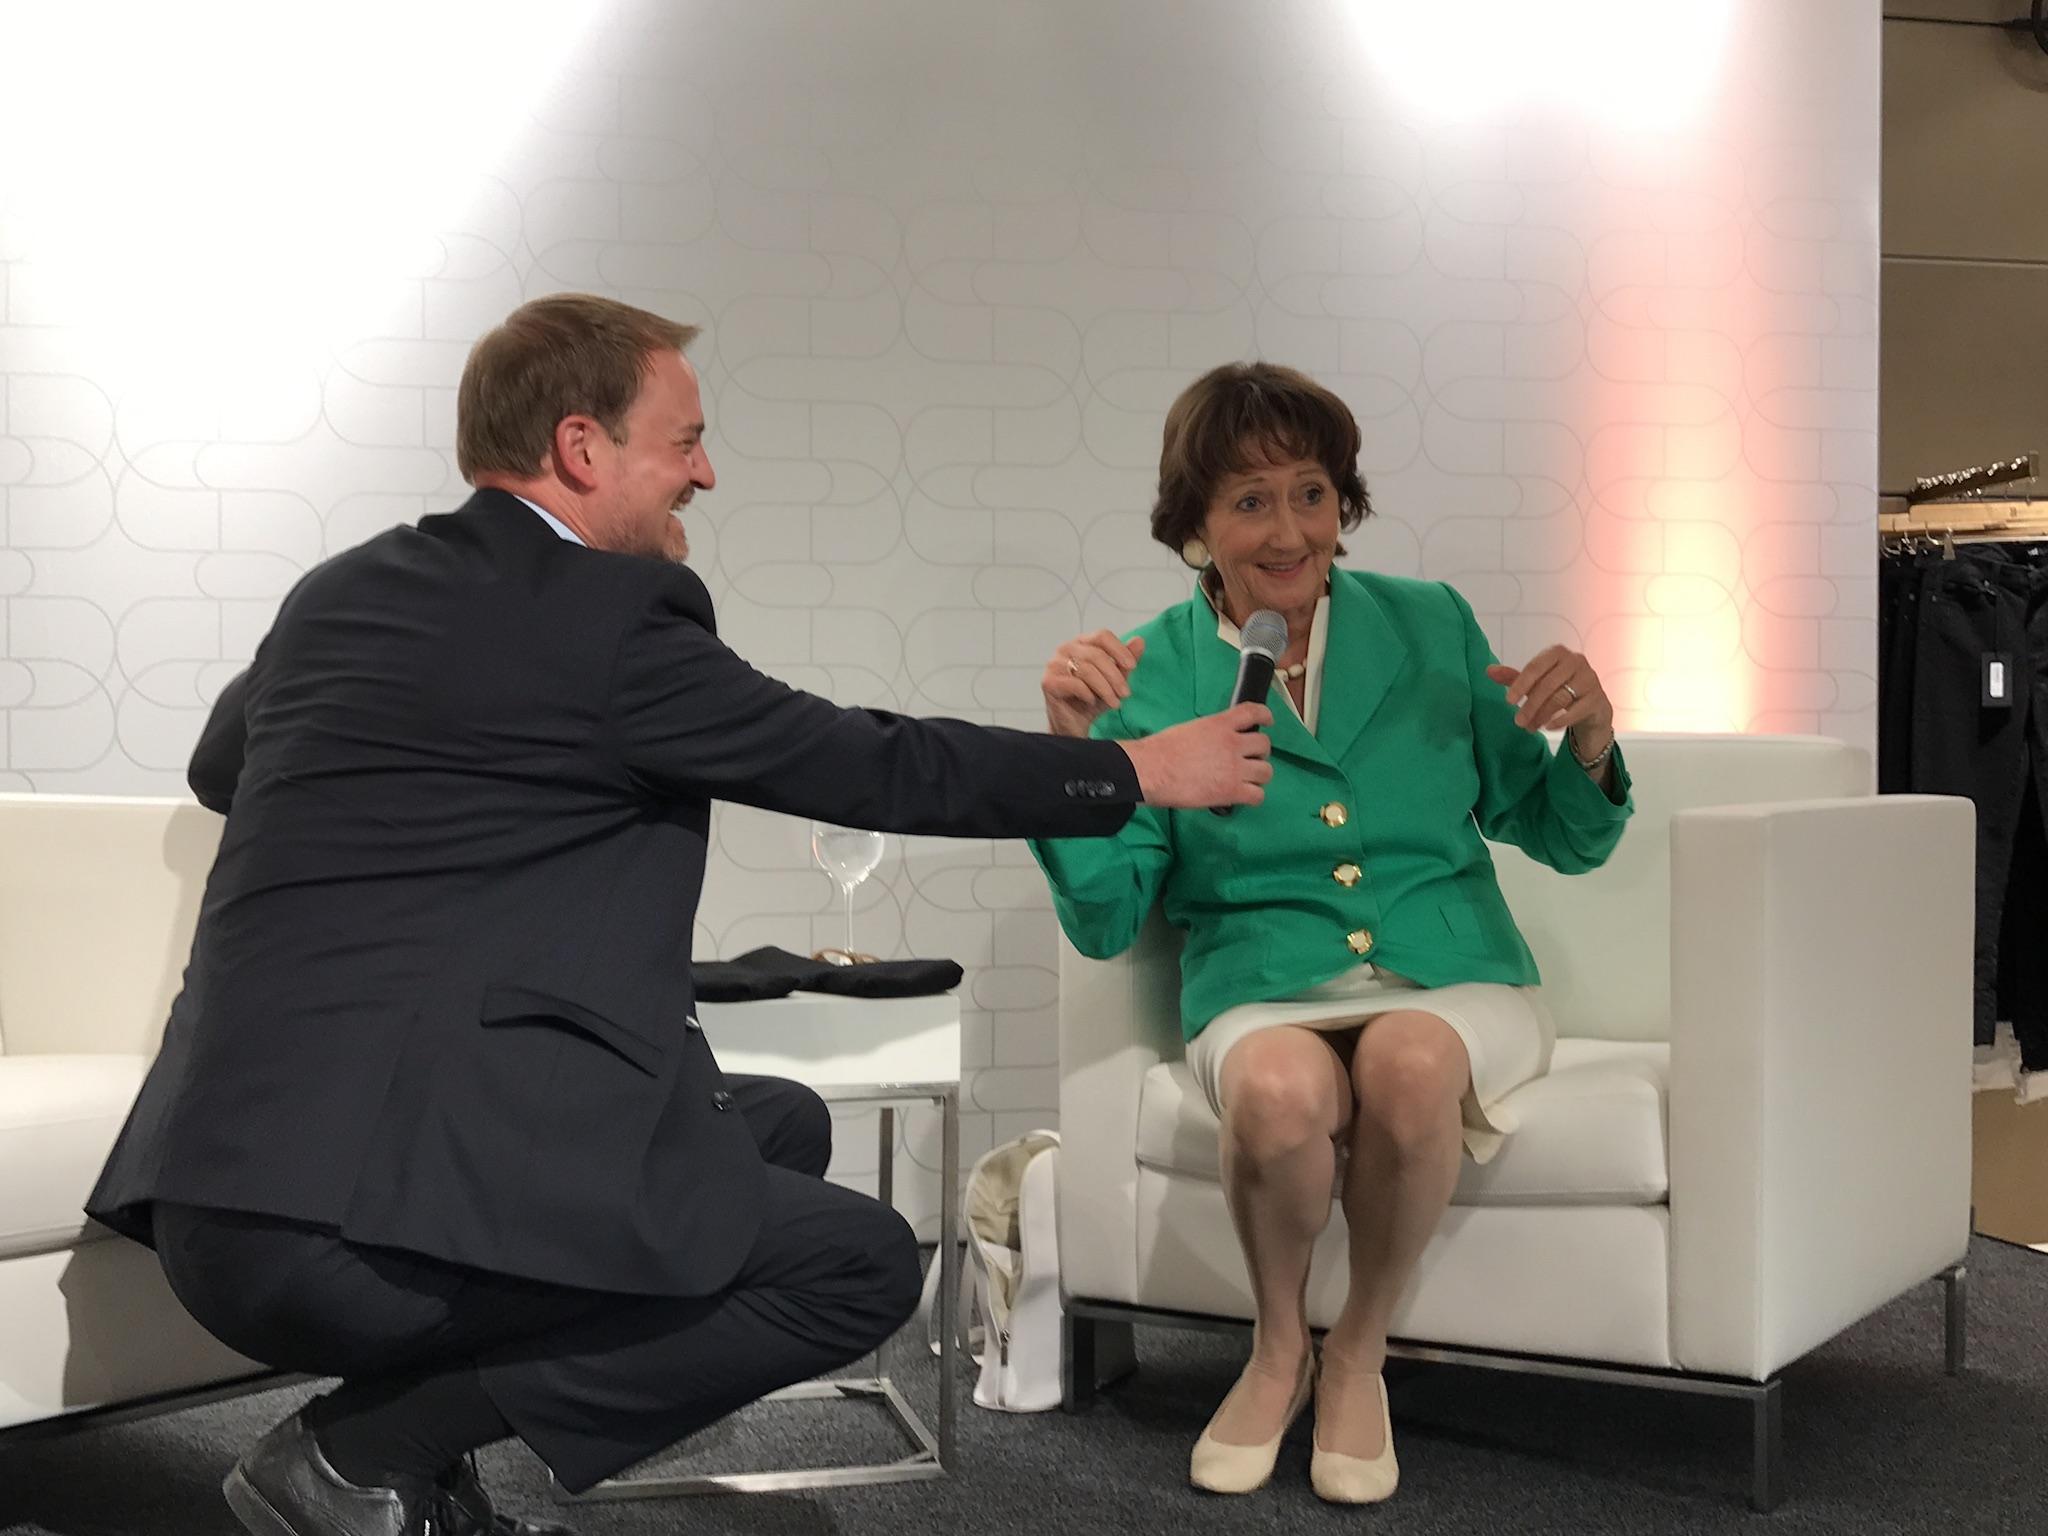 Dr. Helga Breuninger im Gespräch mit christian Zeelen, Talk mit Dr. Helga Breuninger, Lieblingsstil.com,